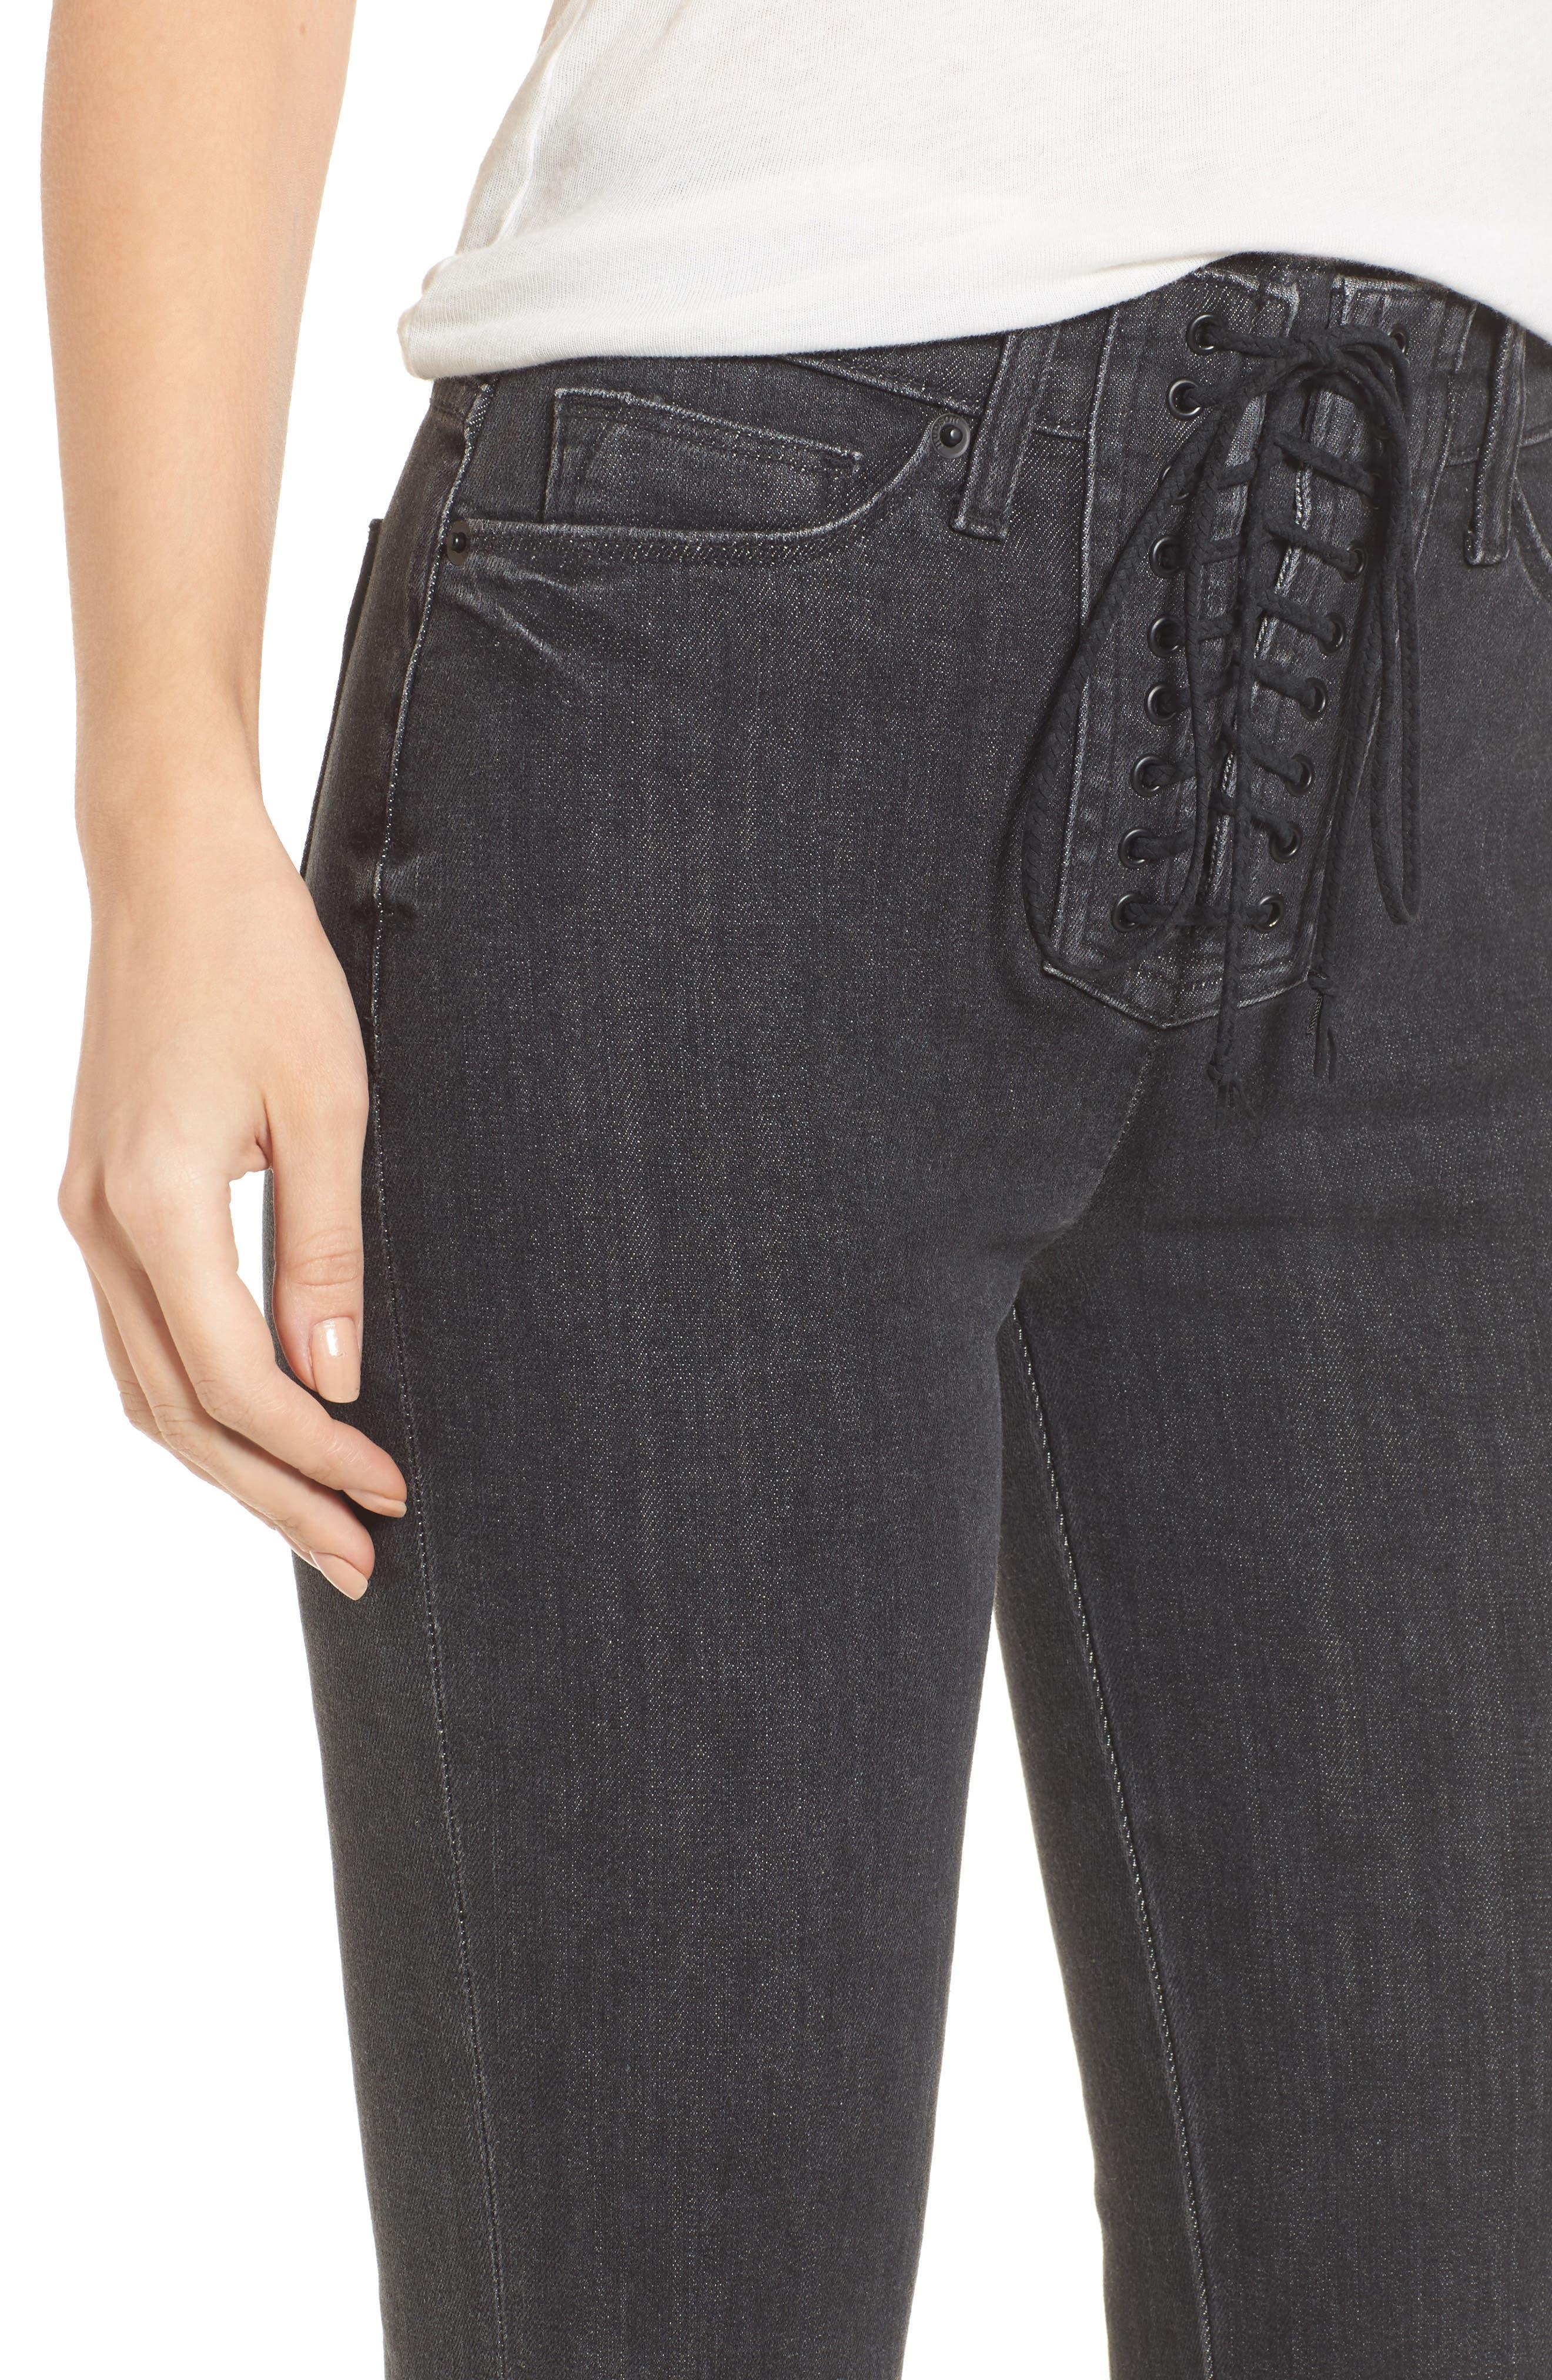 Bullocks High Waist Lace-Up Flare Jeans,                             Alternate thumbnail 4, color,                             064